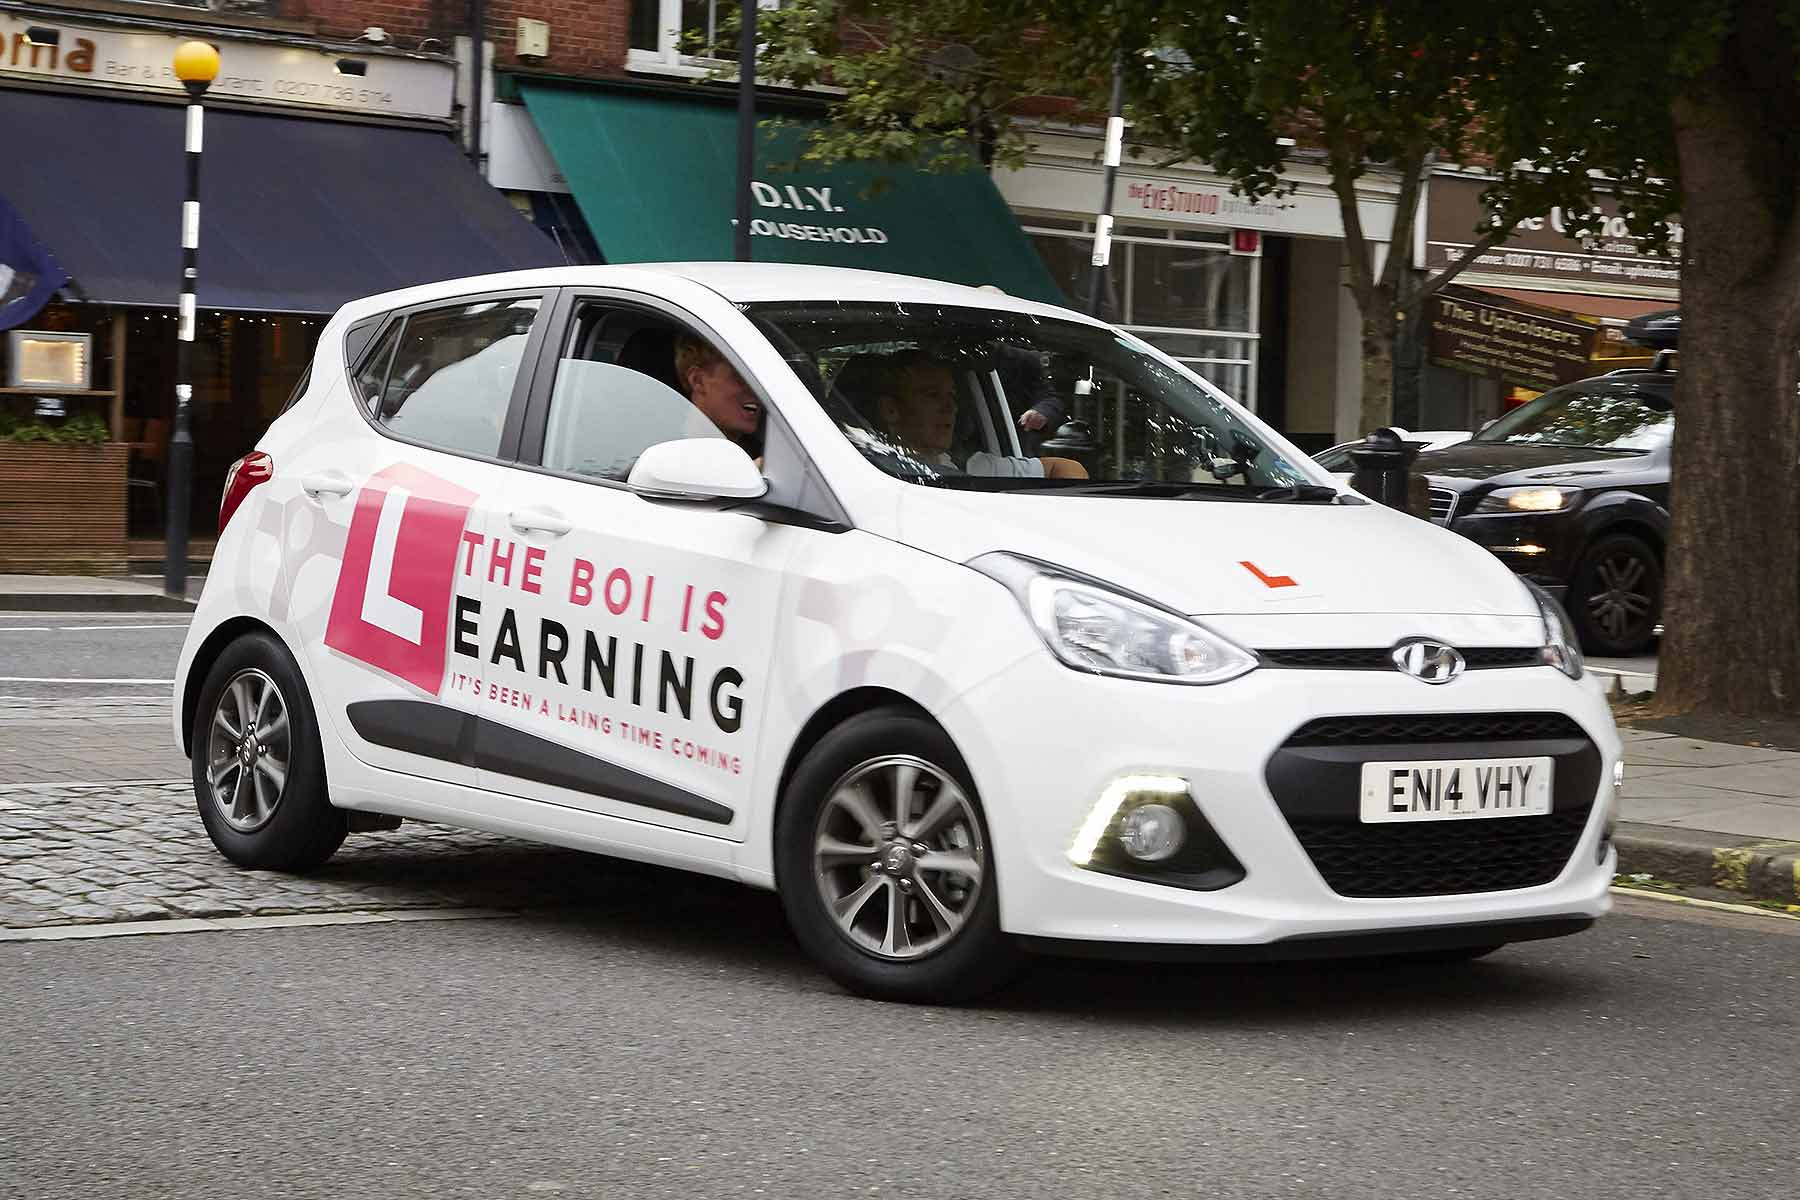 Hyundai learner driver